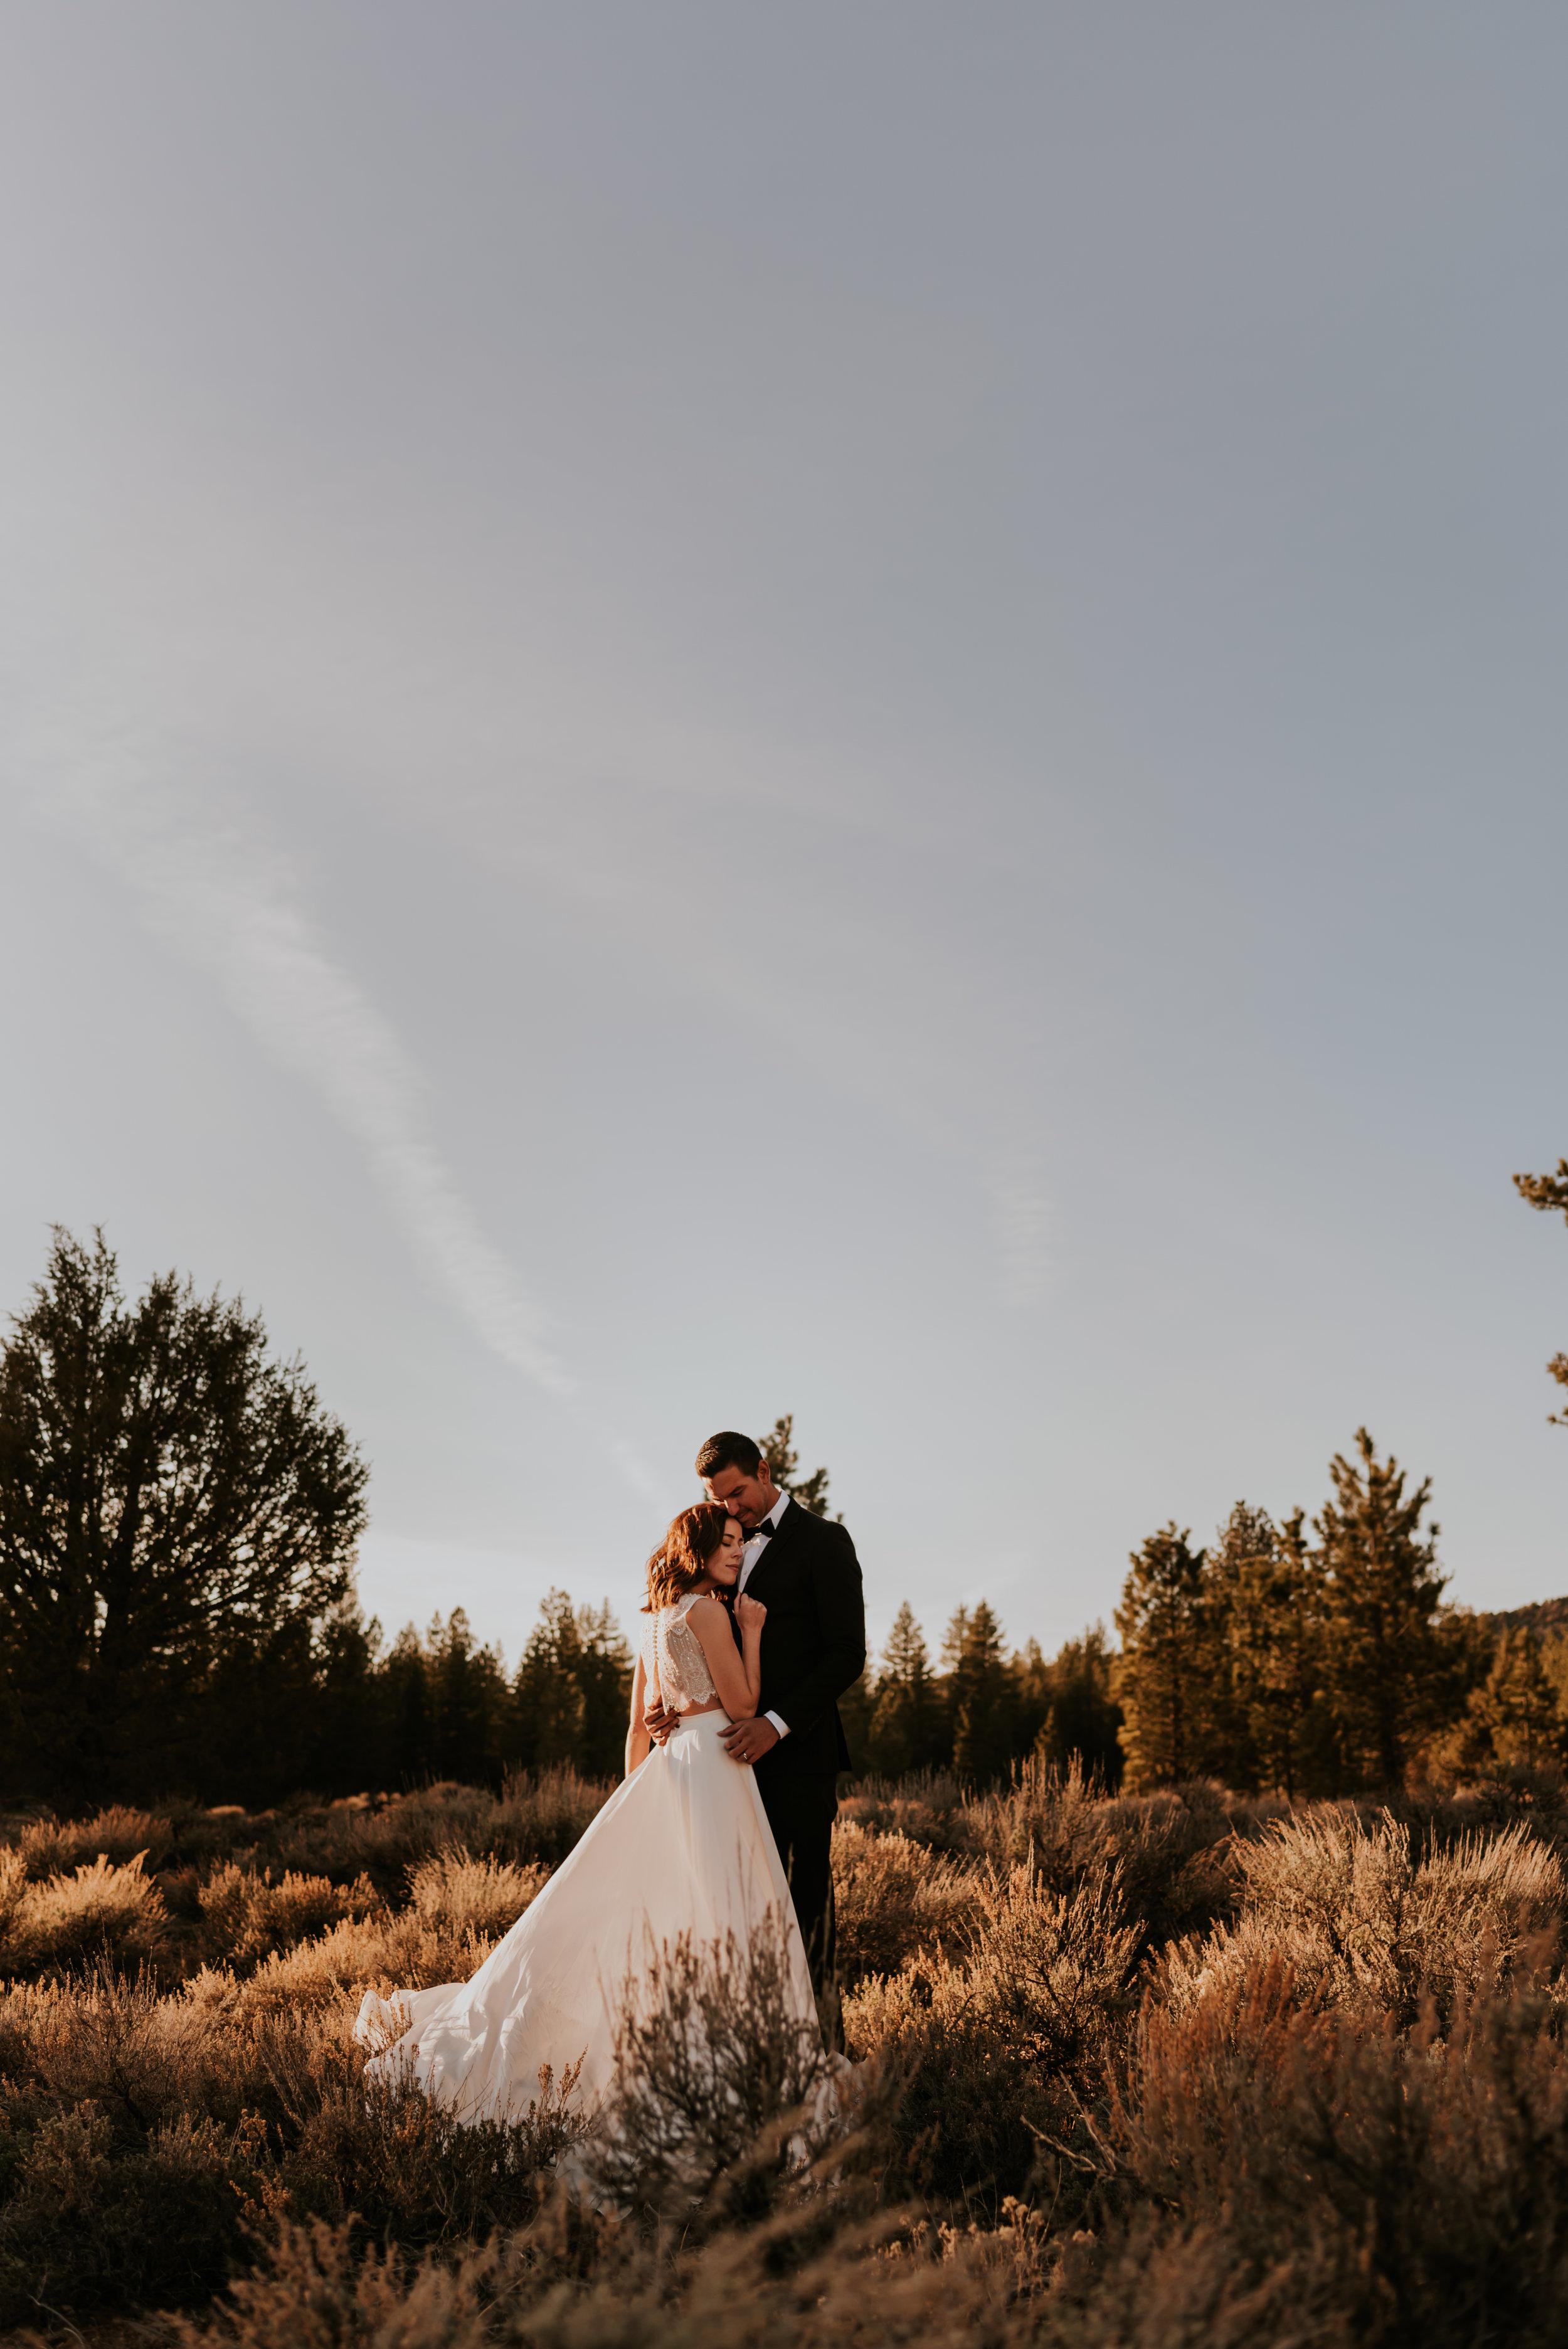 big-bear-bridals-elopement-wedding-photography-114.jpg